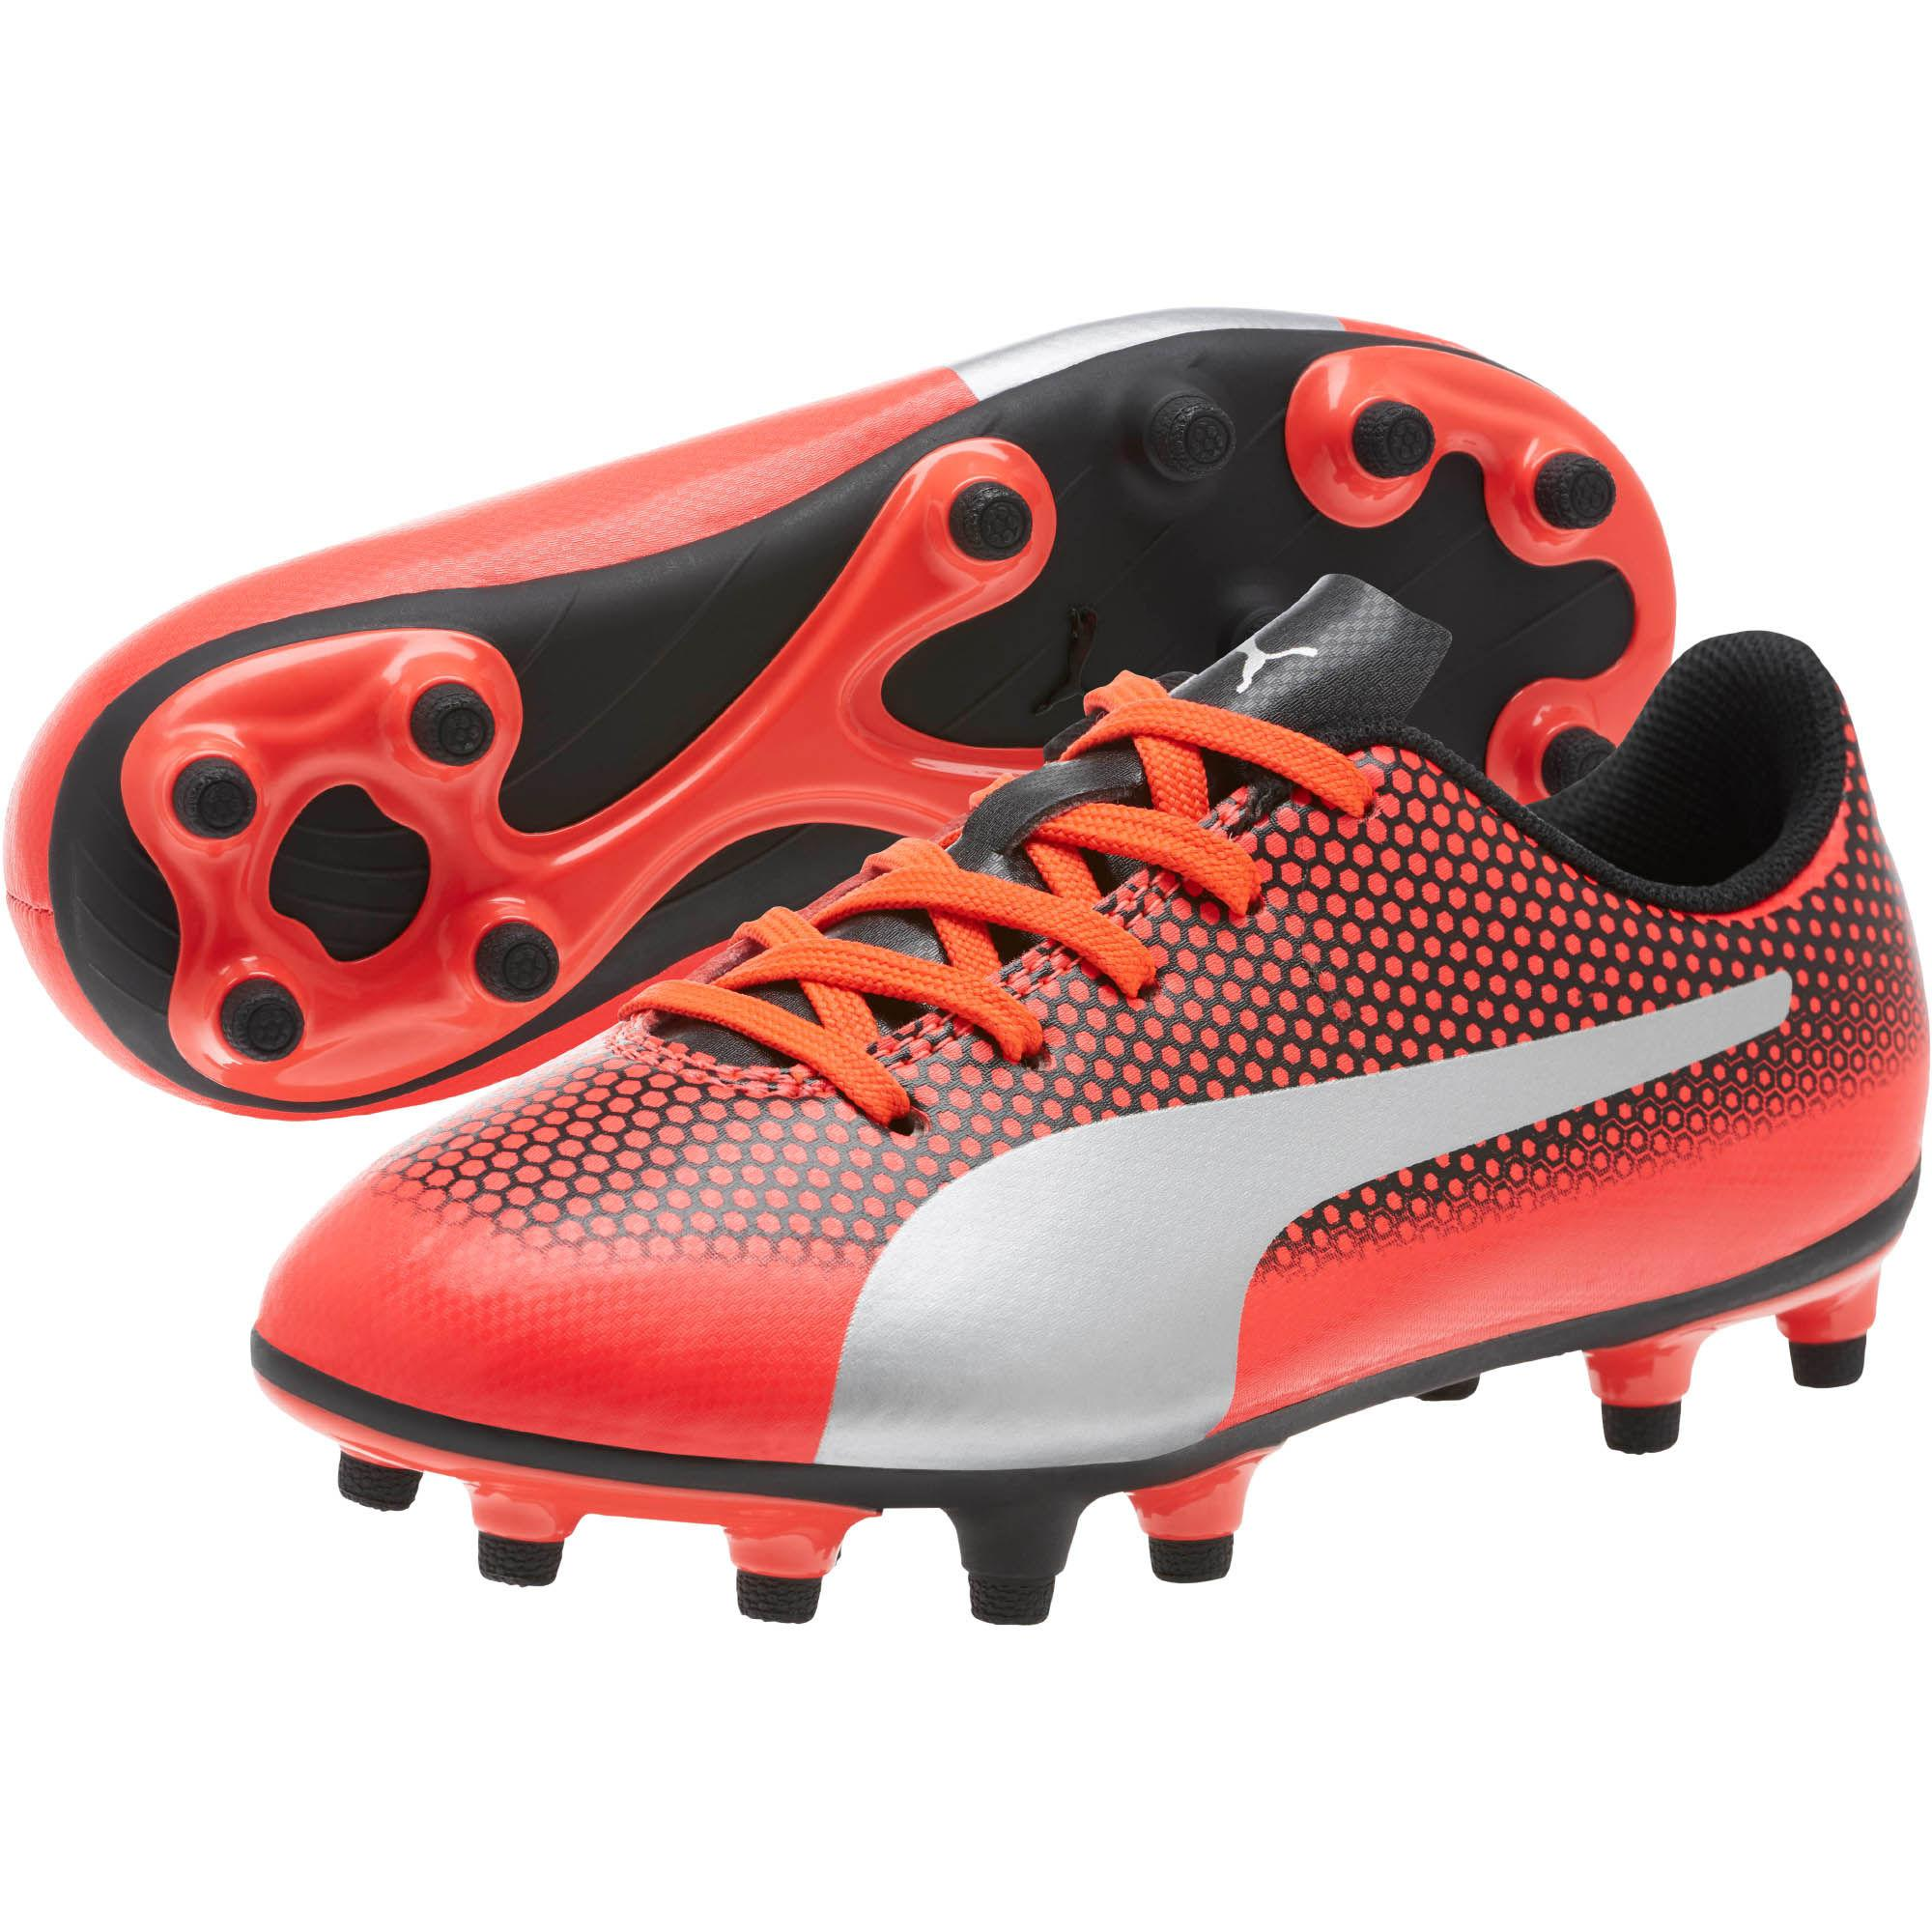 bf7a7cbbc18 ... hot puma red spirit fg jr soccer cleats for men lyst. view fullscreen  45797 66a21